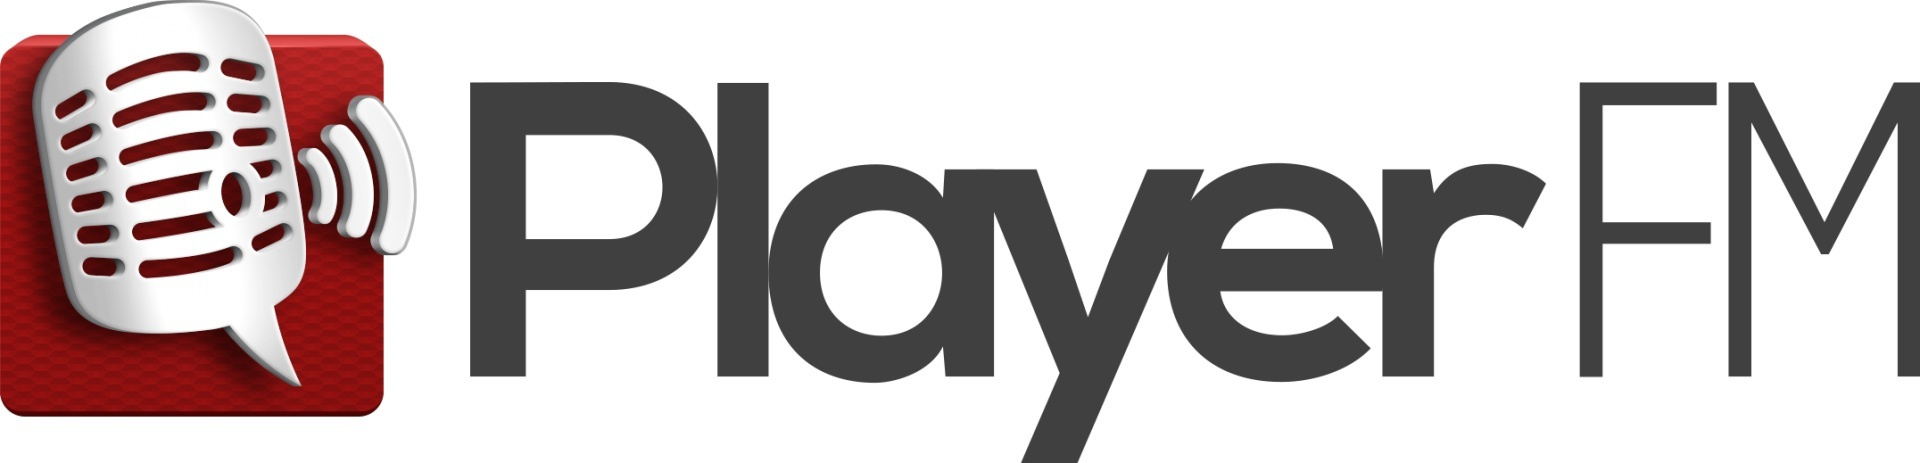 PlayerFM.jpg